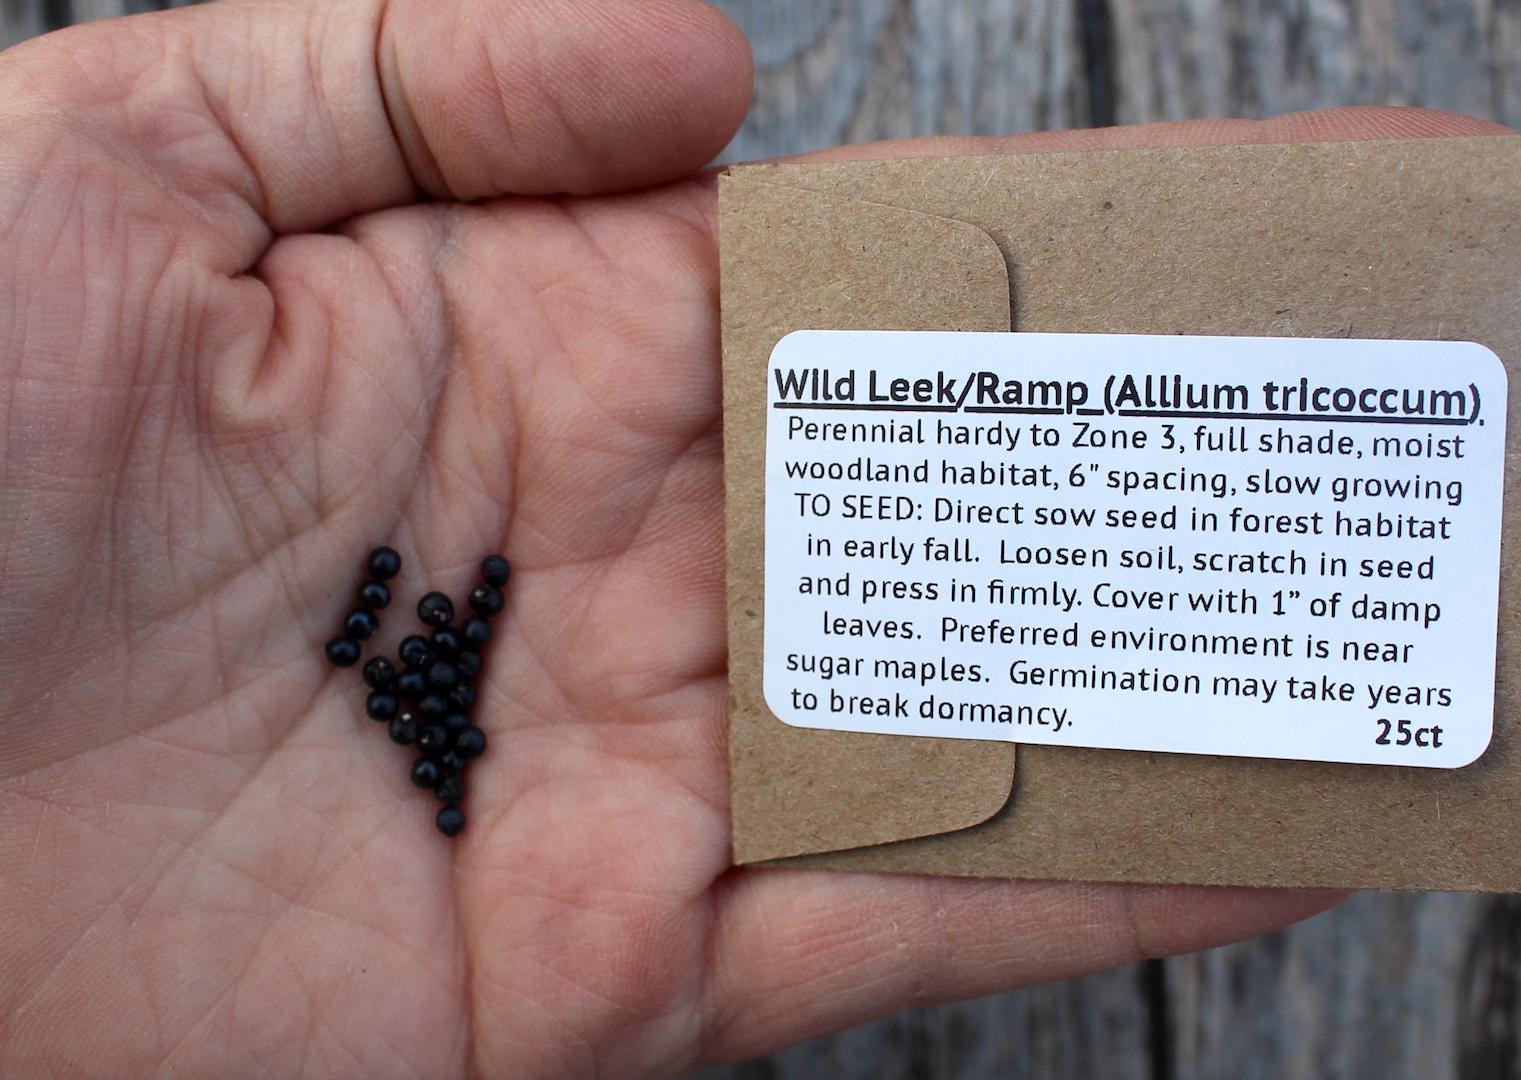 Wild Leek Seeds